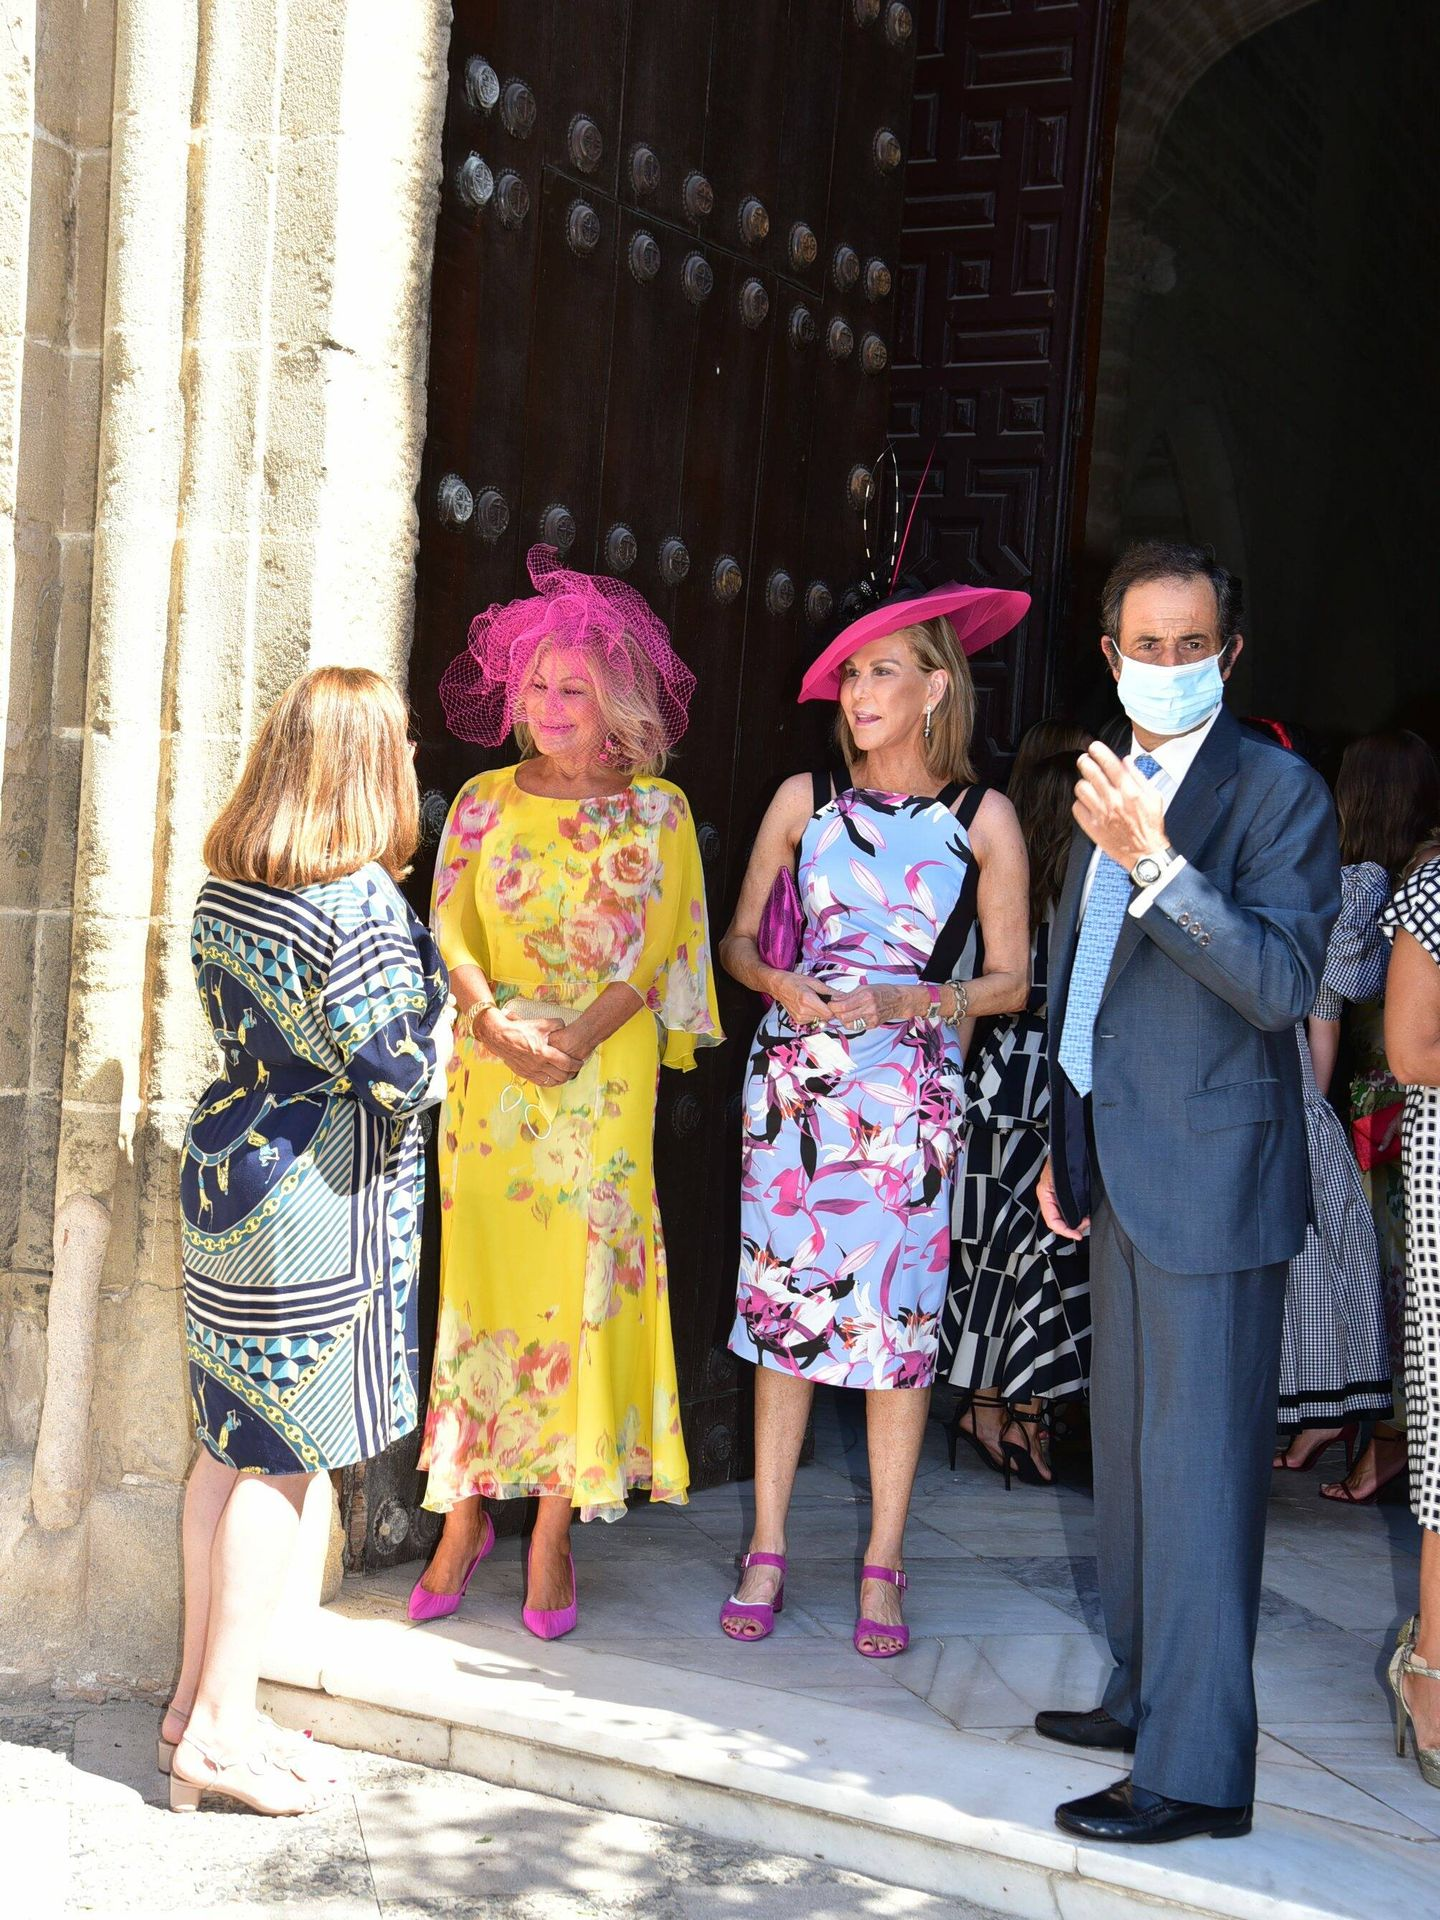 Cari Lapique, de amarillo, conversa en la puerta de la iglesia. (Cordon Press)